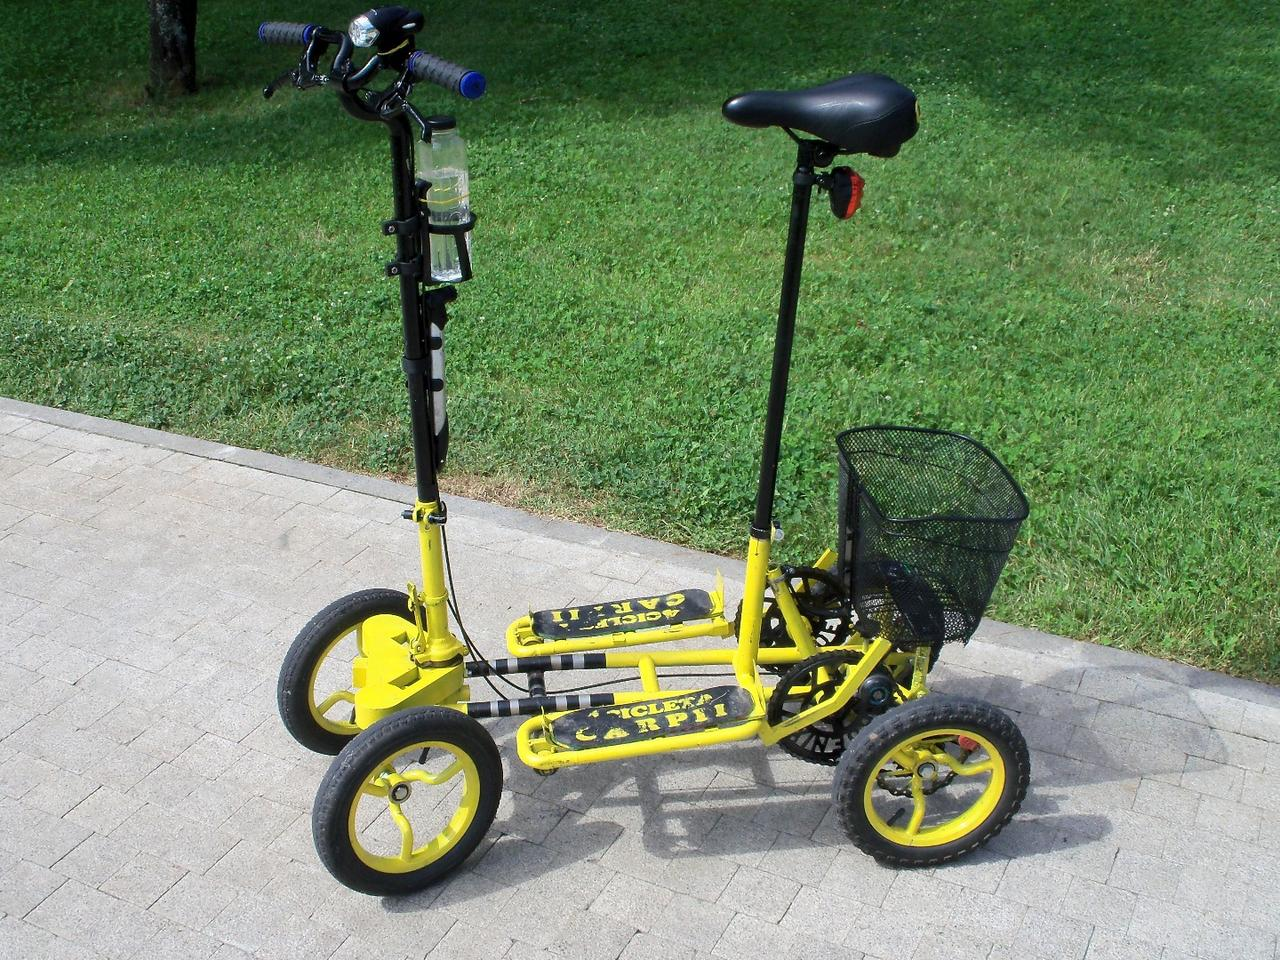 Carpii 4ciclet: an unique way to get around